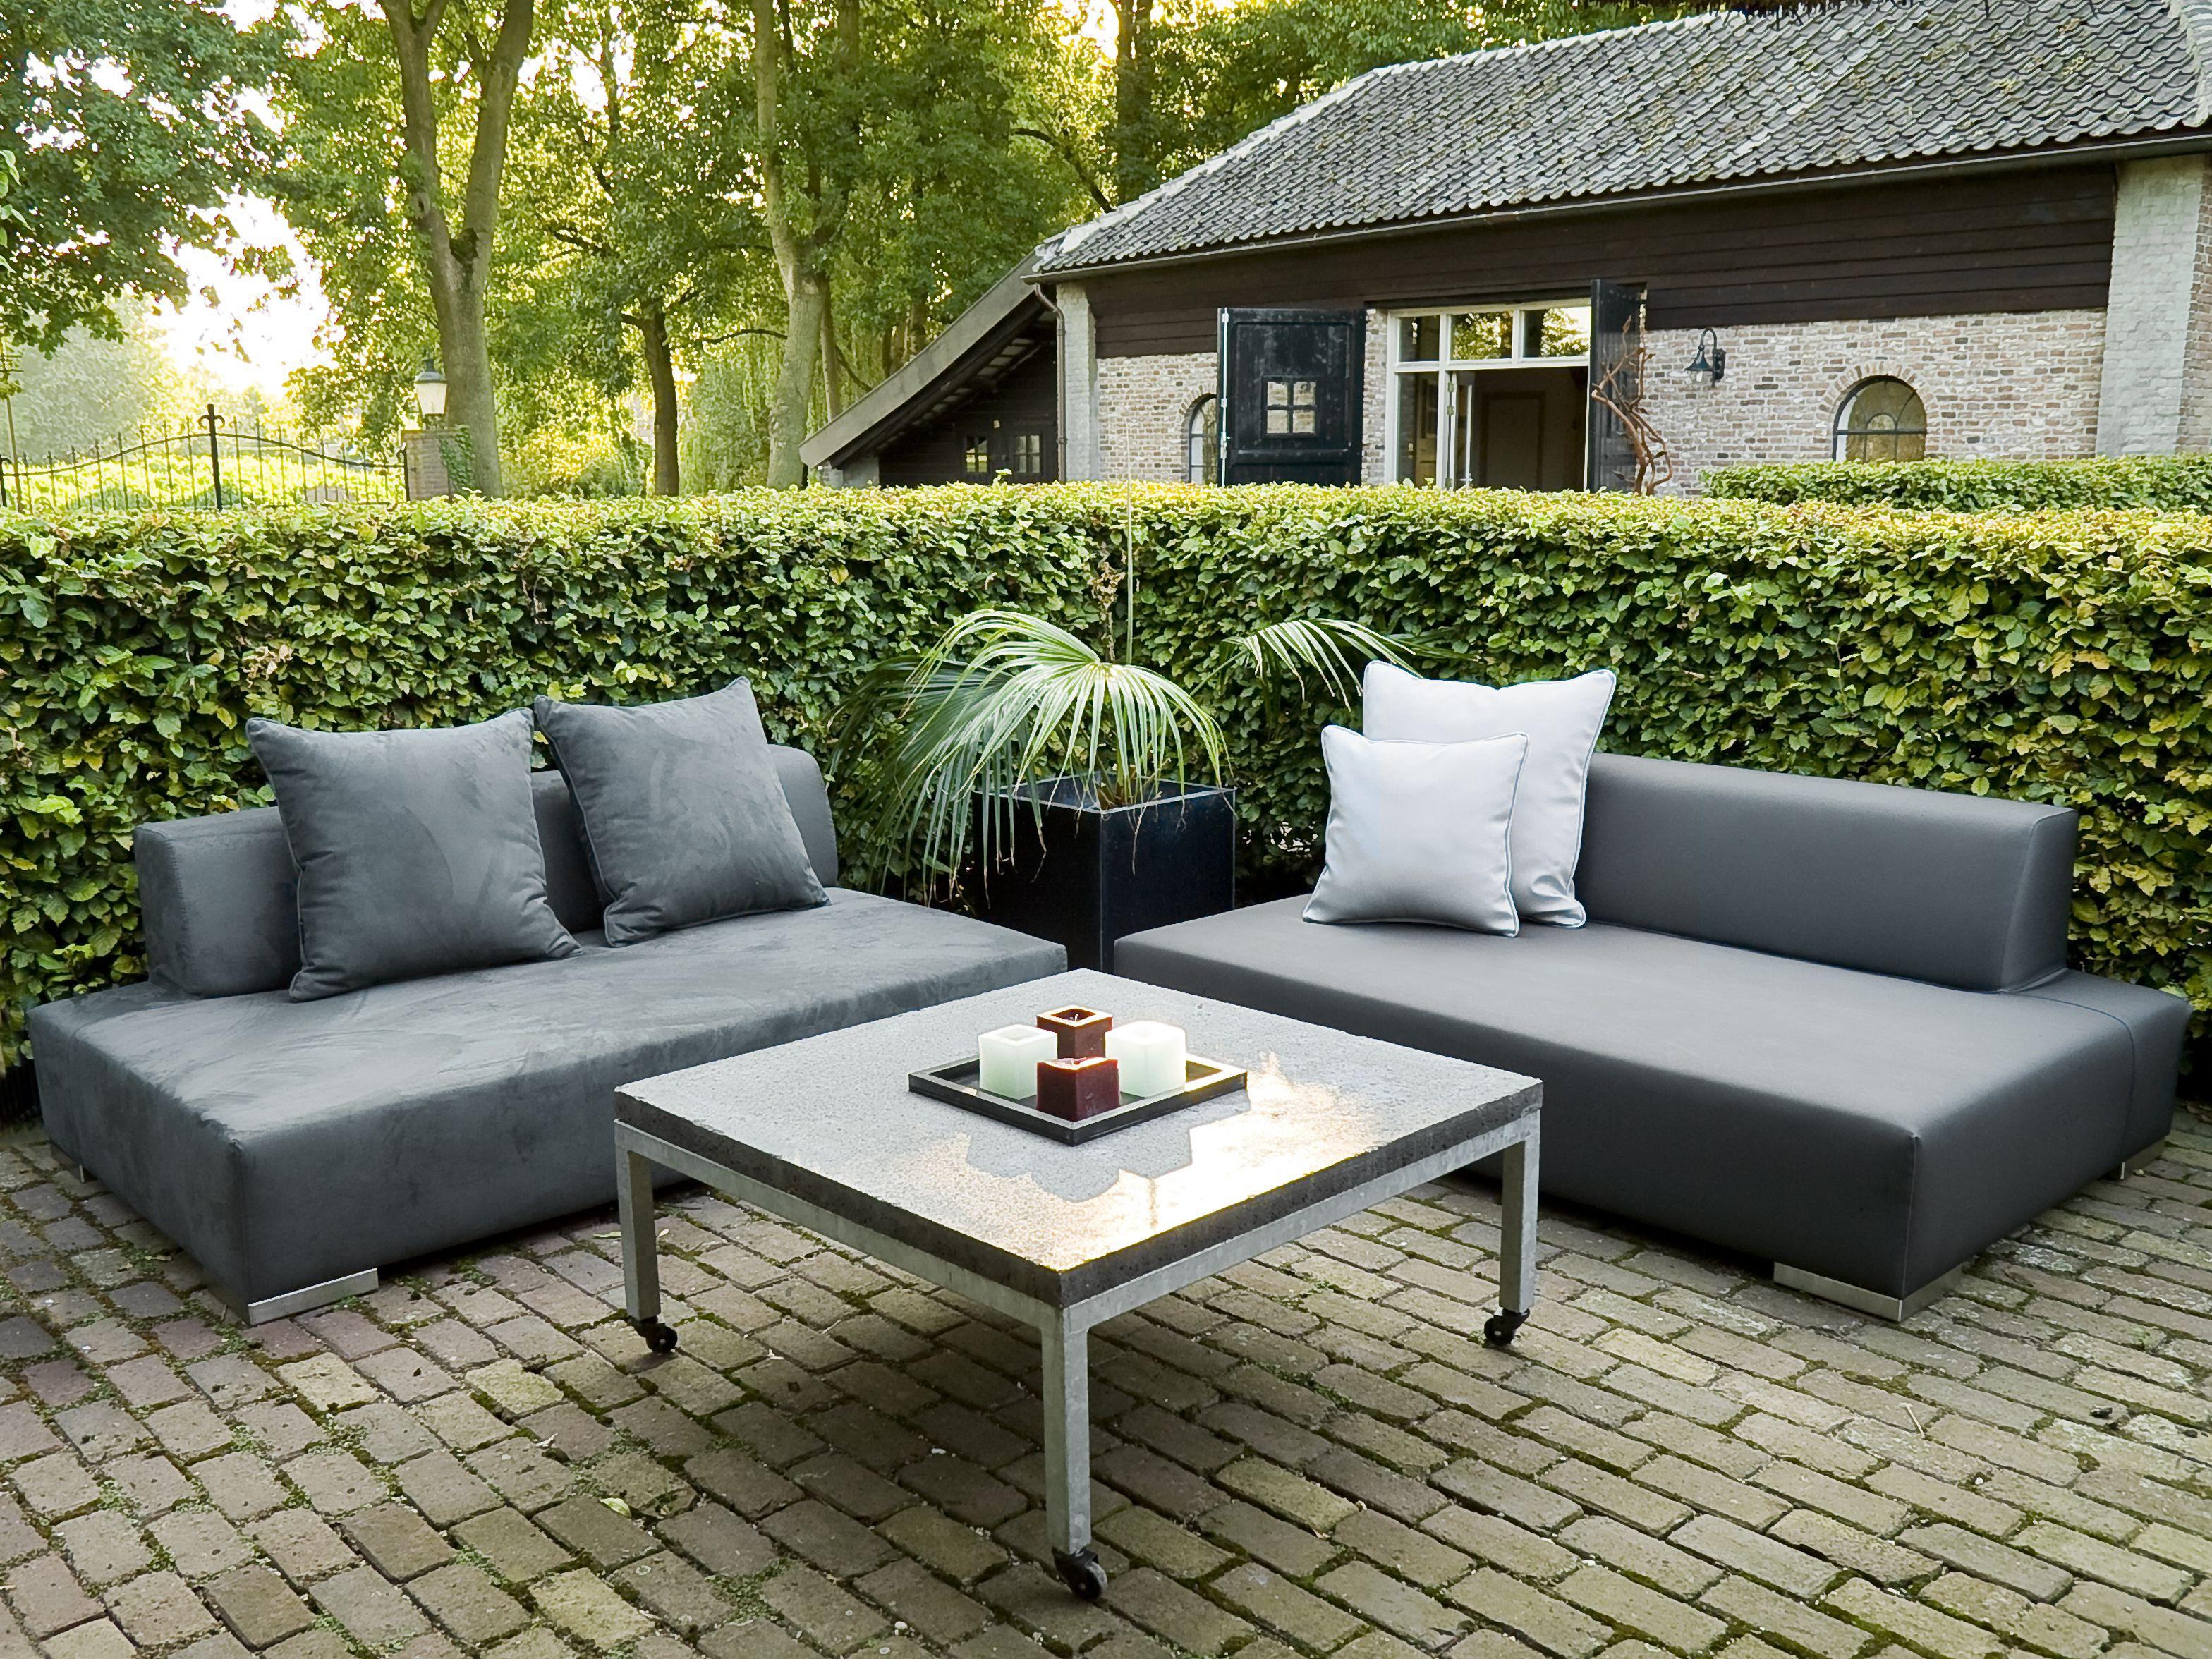 Design chill zero d c zero sofa paardekooper